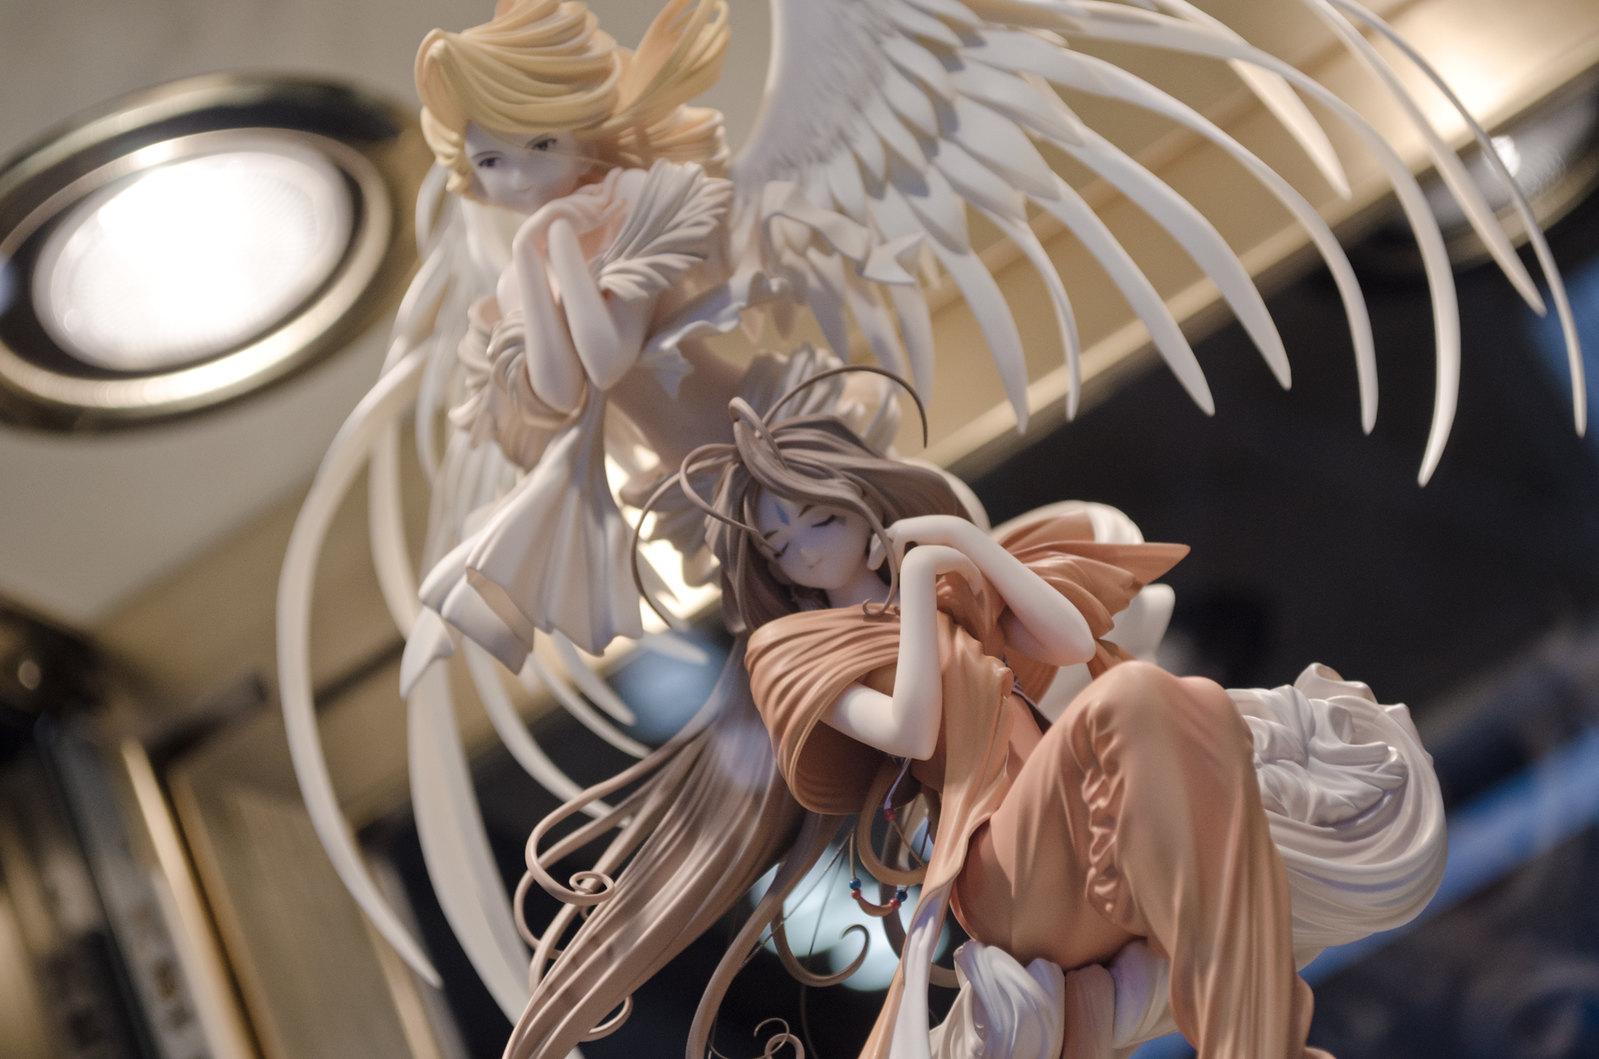 Ah my Goddess Figure